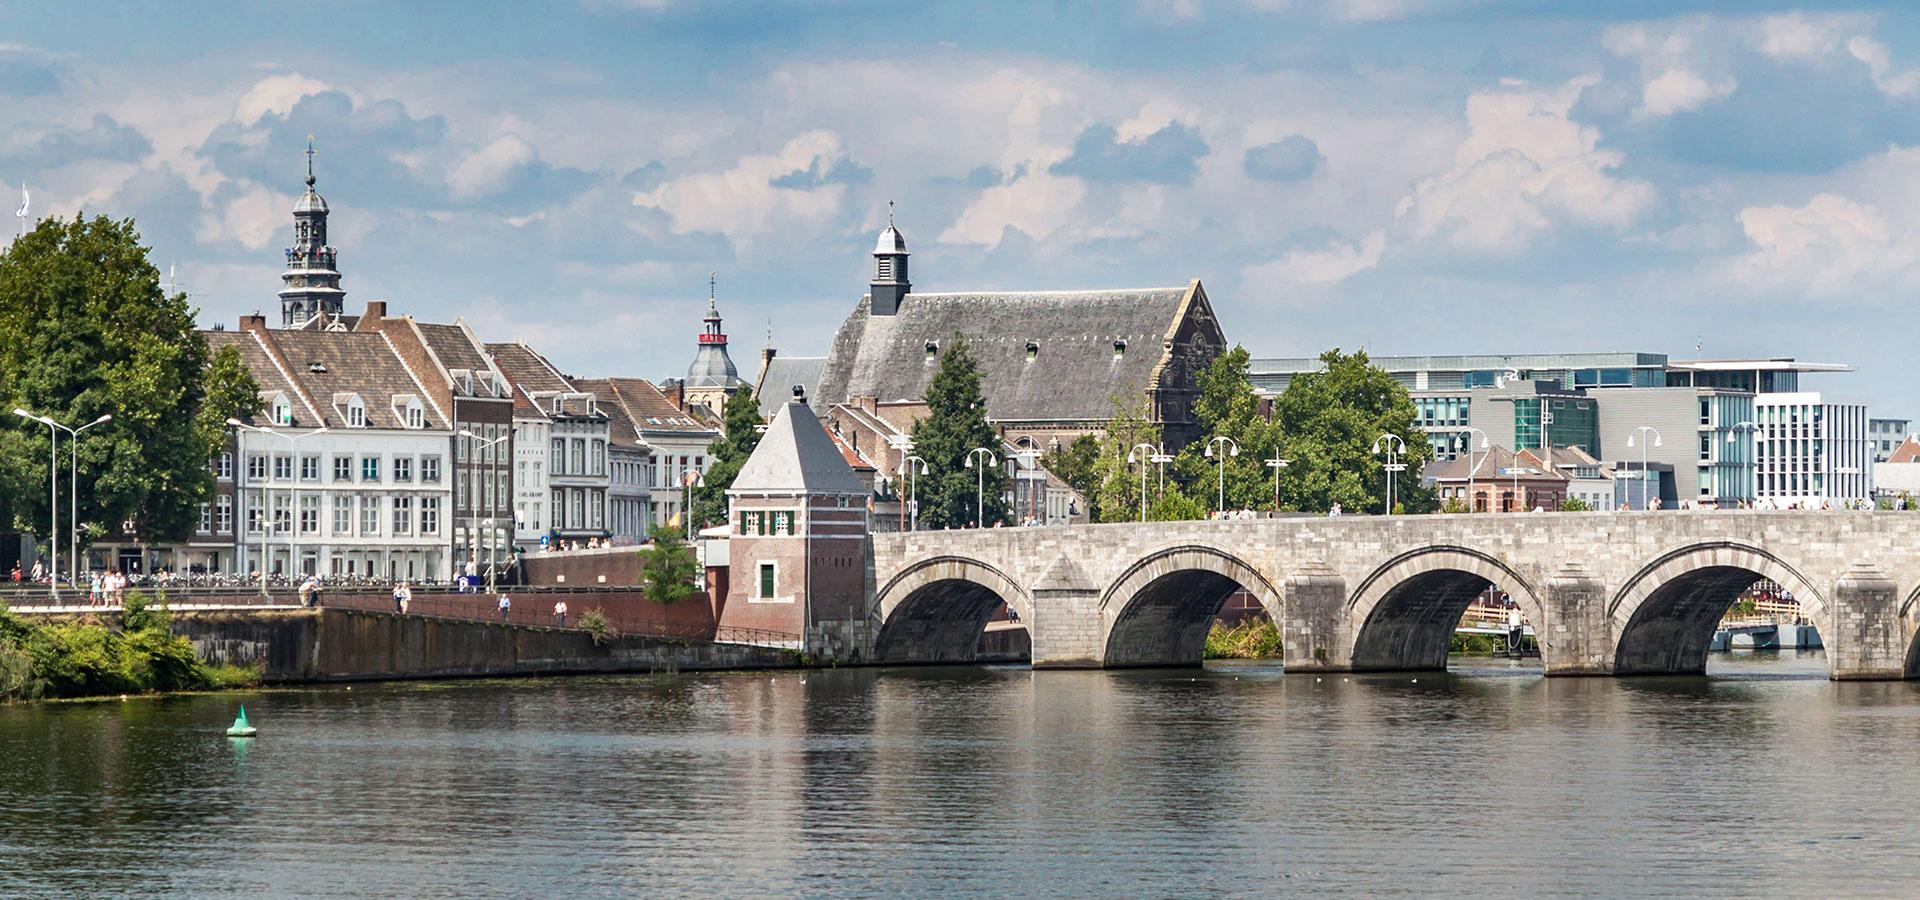 Omgeving - Limburgia